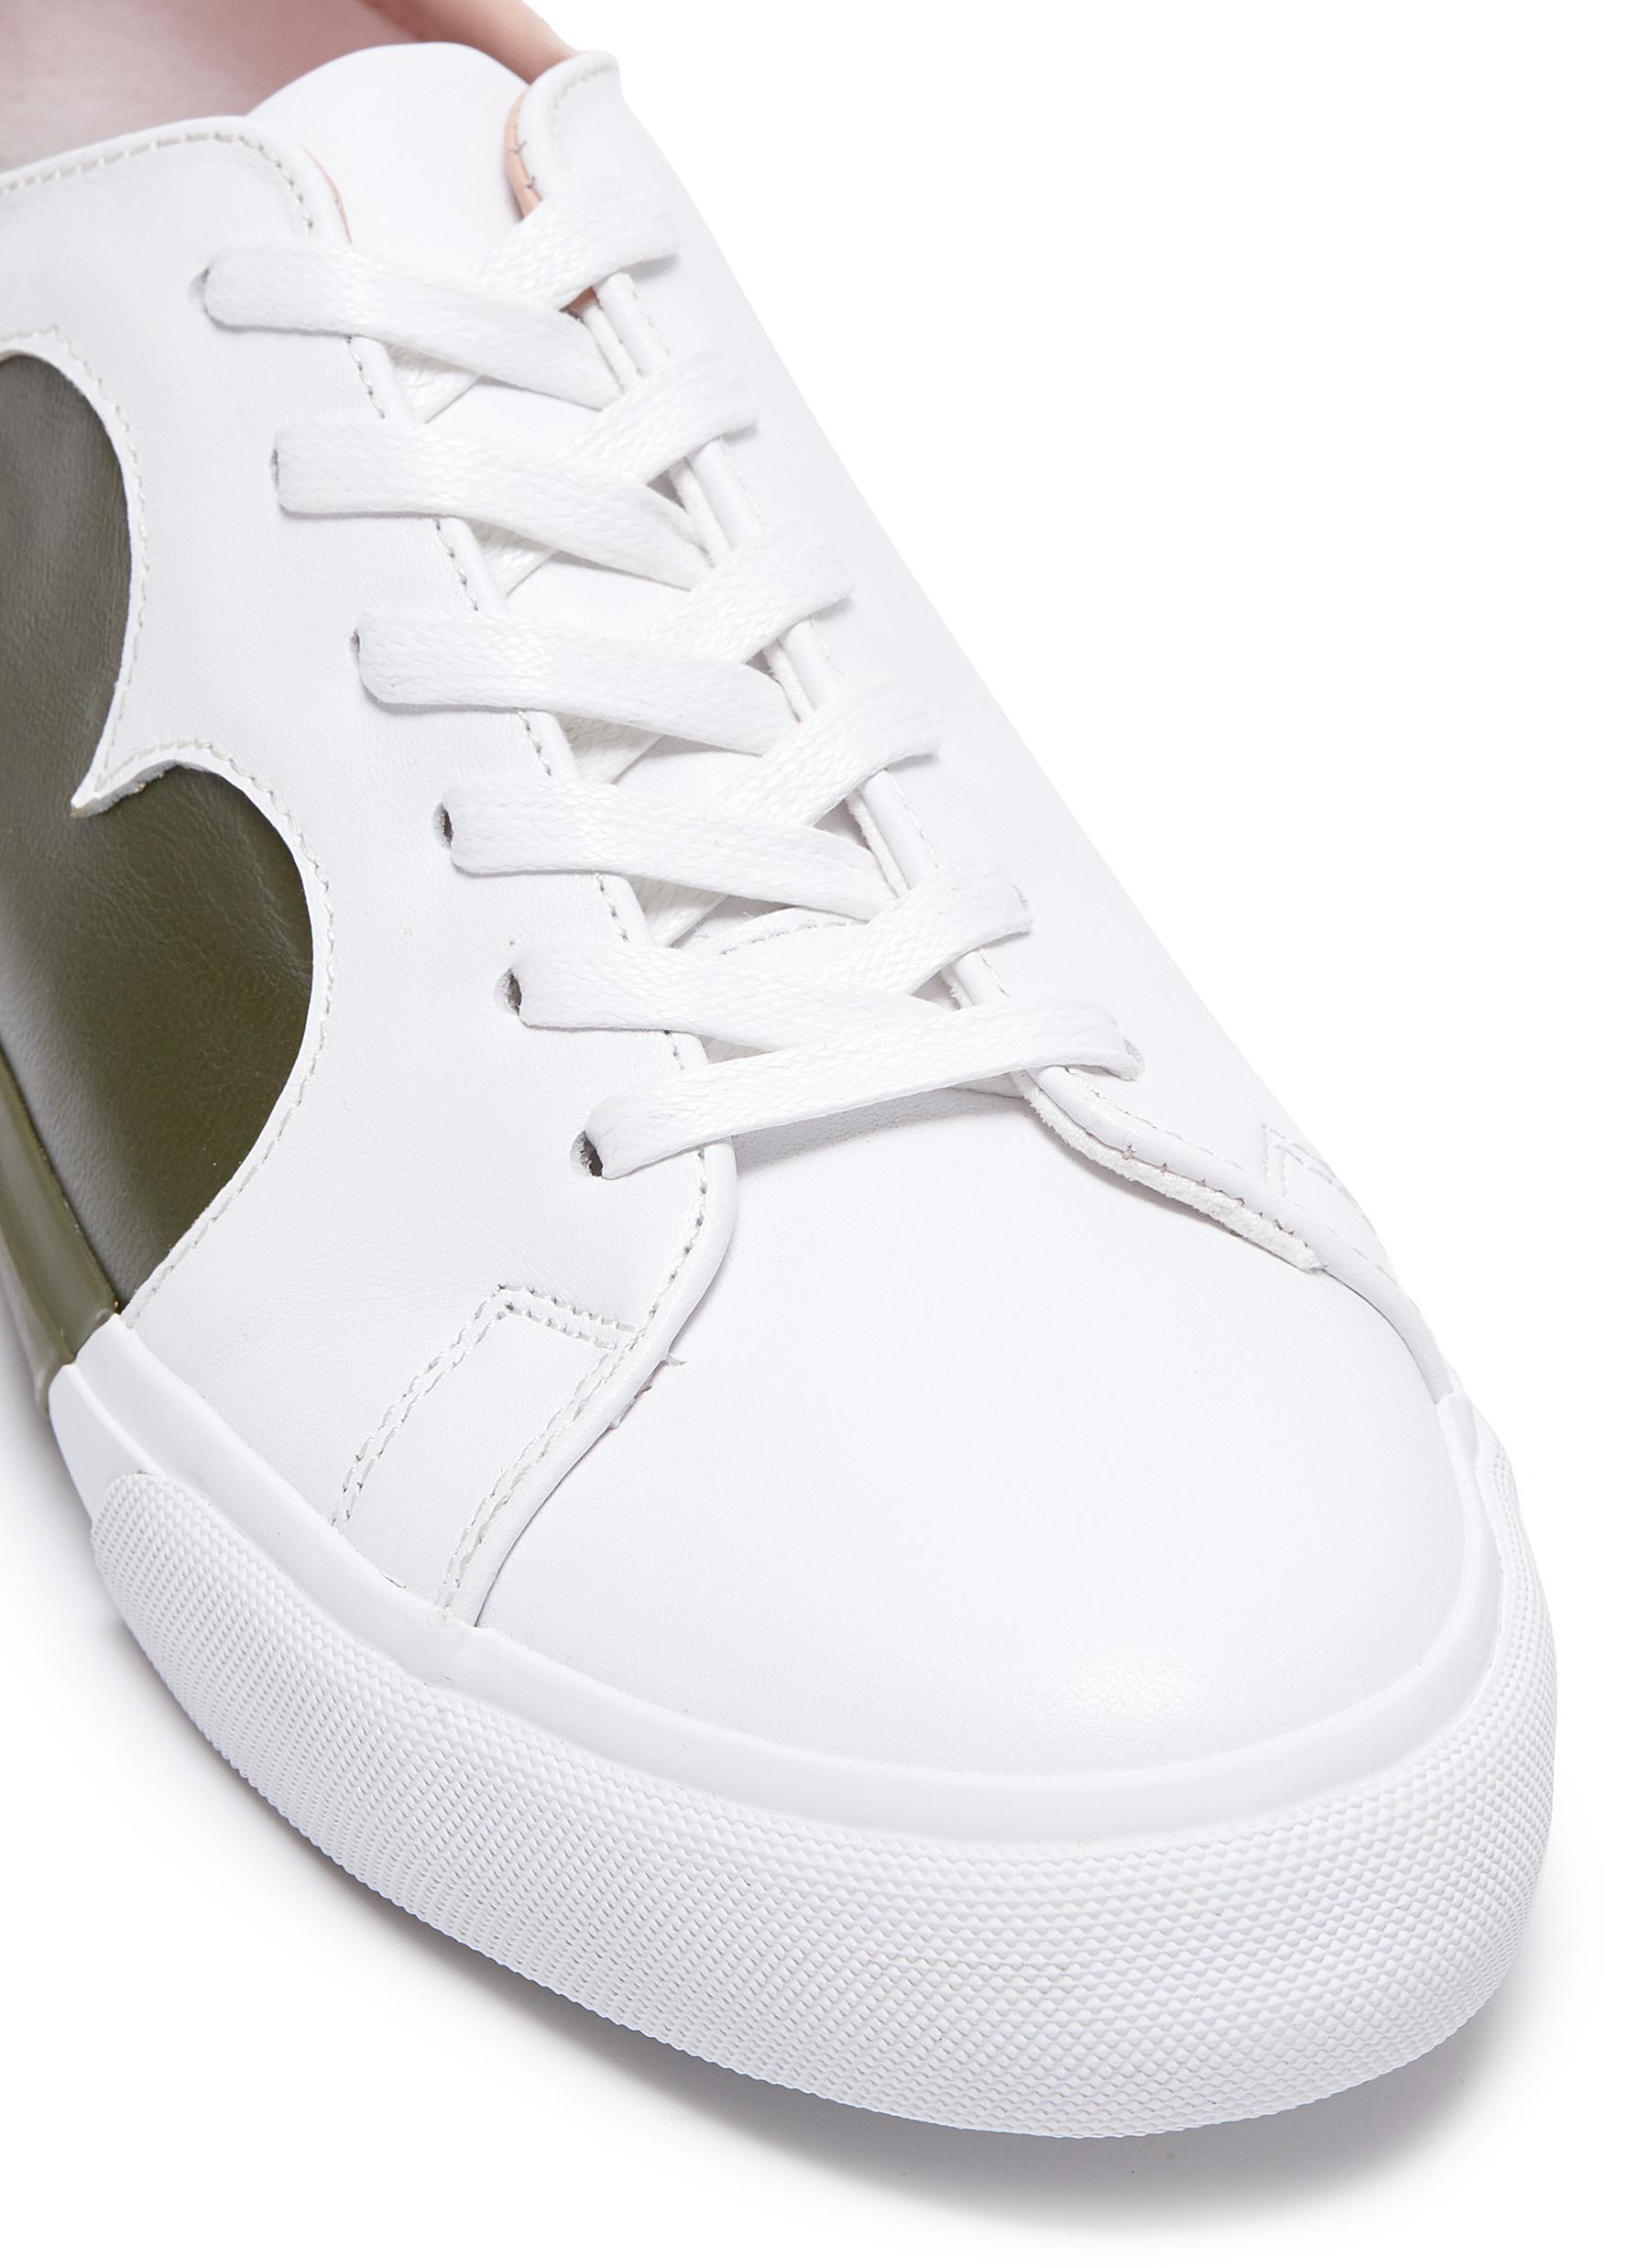 Pedder Red 'josie' Heart Reverse Appliqué Leather Sneakers in White